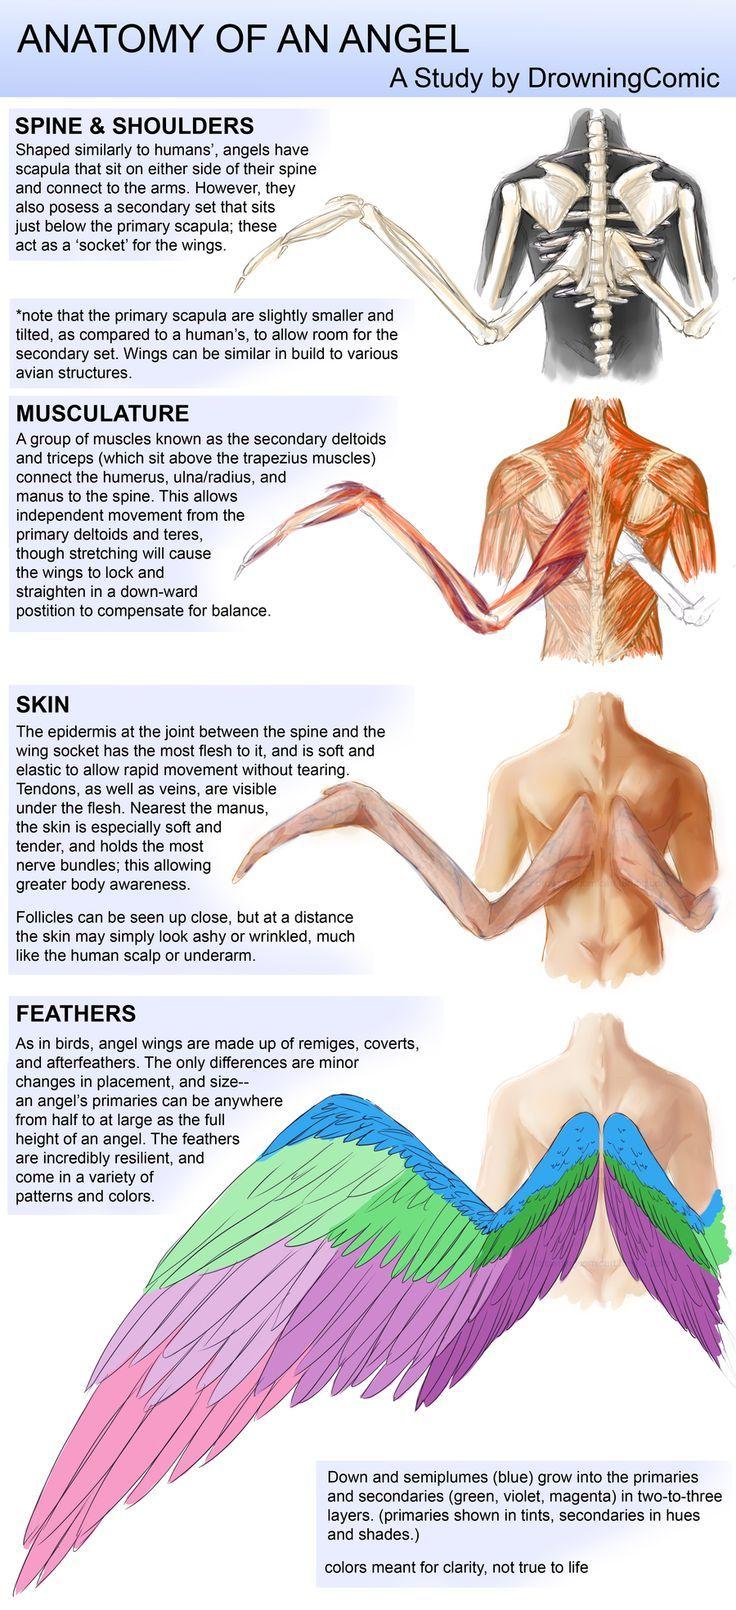 Anatomy Of An Angel by http://DCRoleplays.deviantart.com on @deviantART